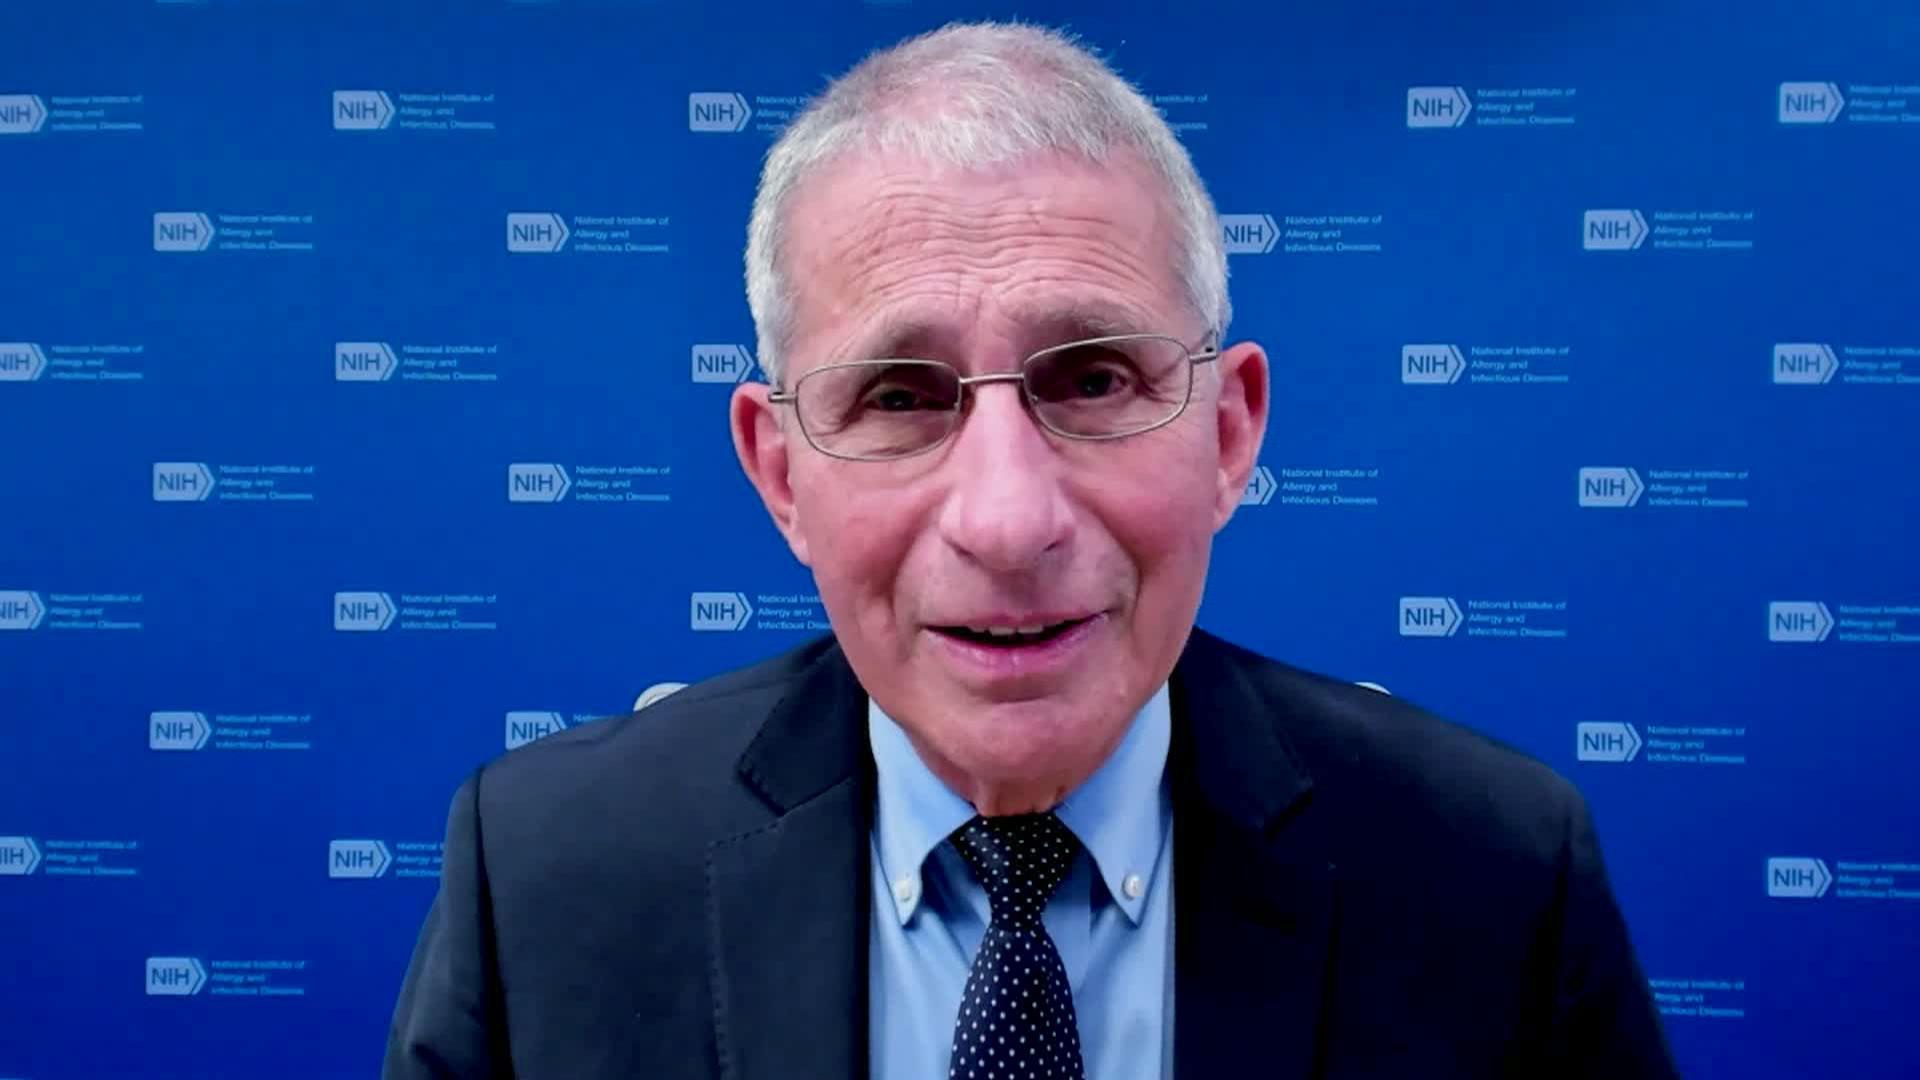 Dr. Anthony Fauci speaks with CNN on Thursday, December 24.